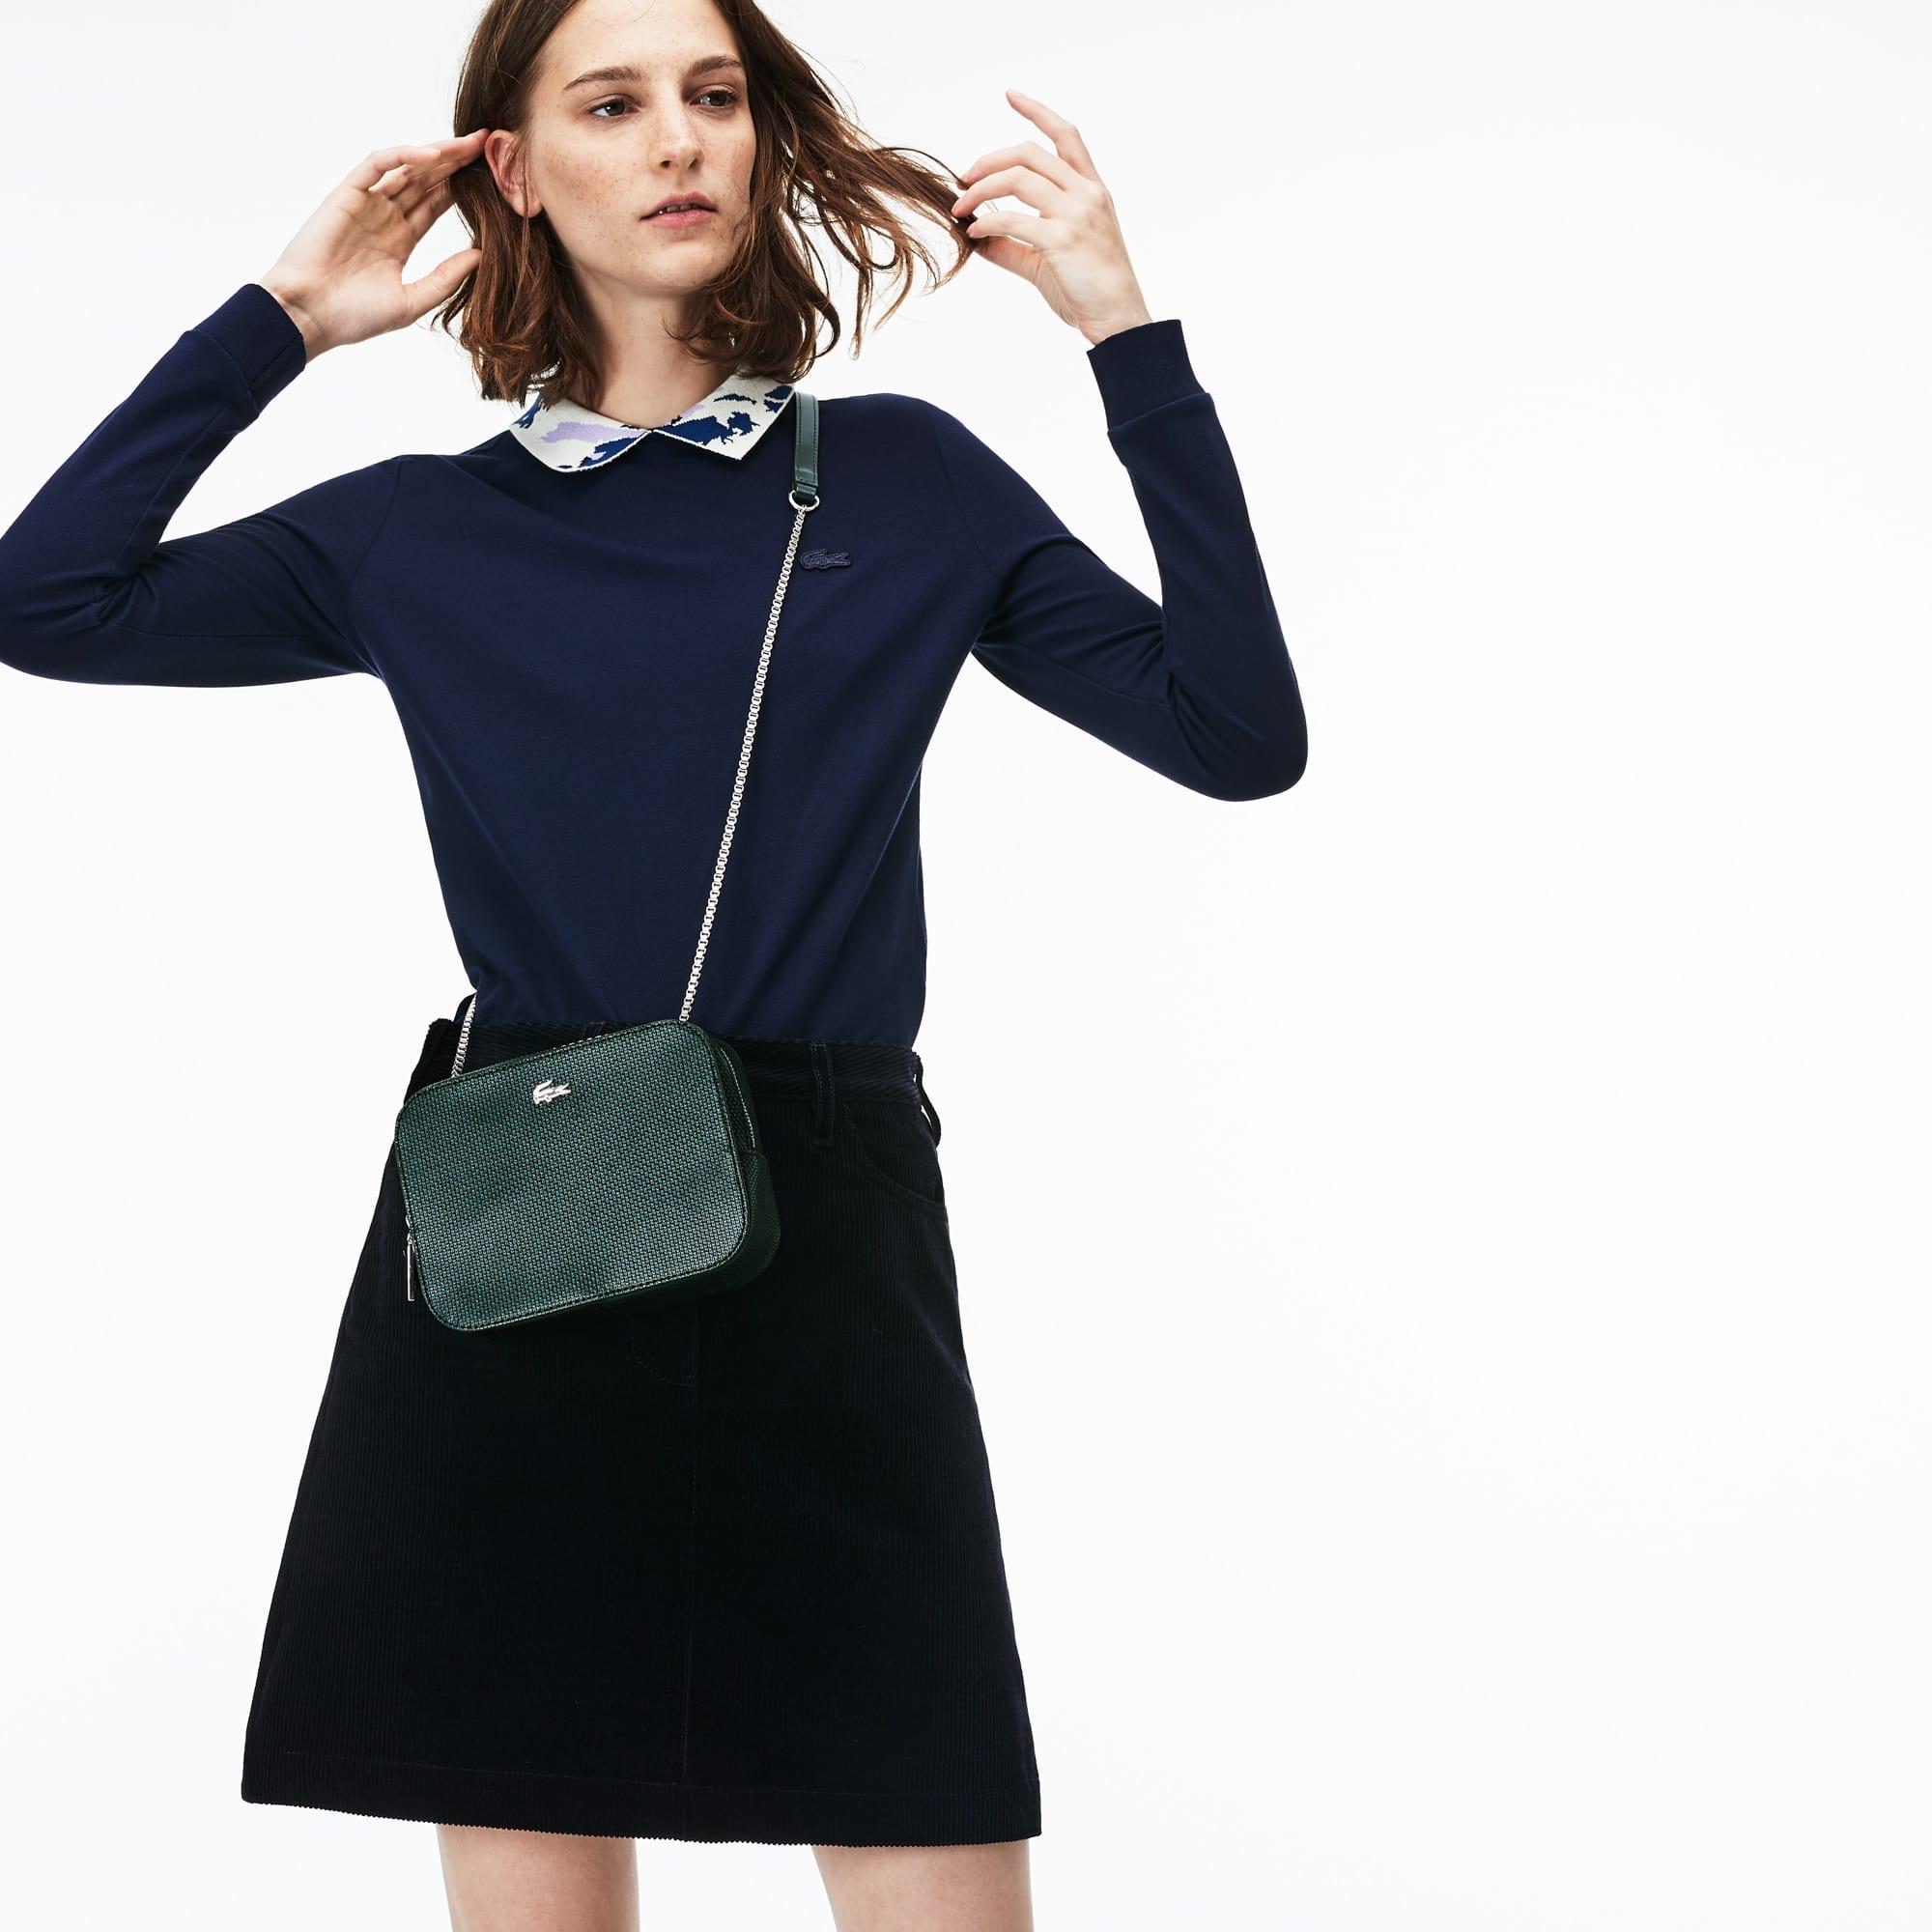 Damen CHANTACO CHRISTMAS Tasche aus Piqué-Leder